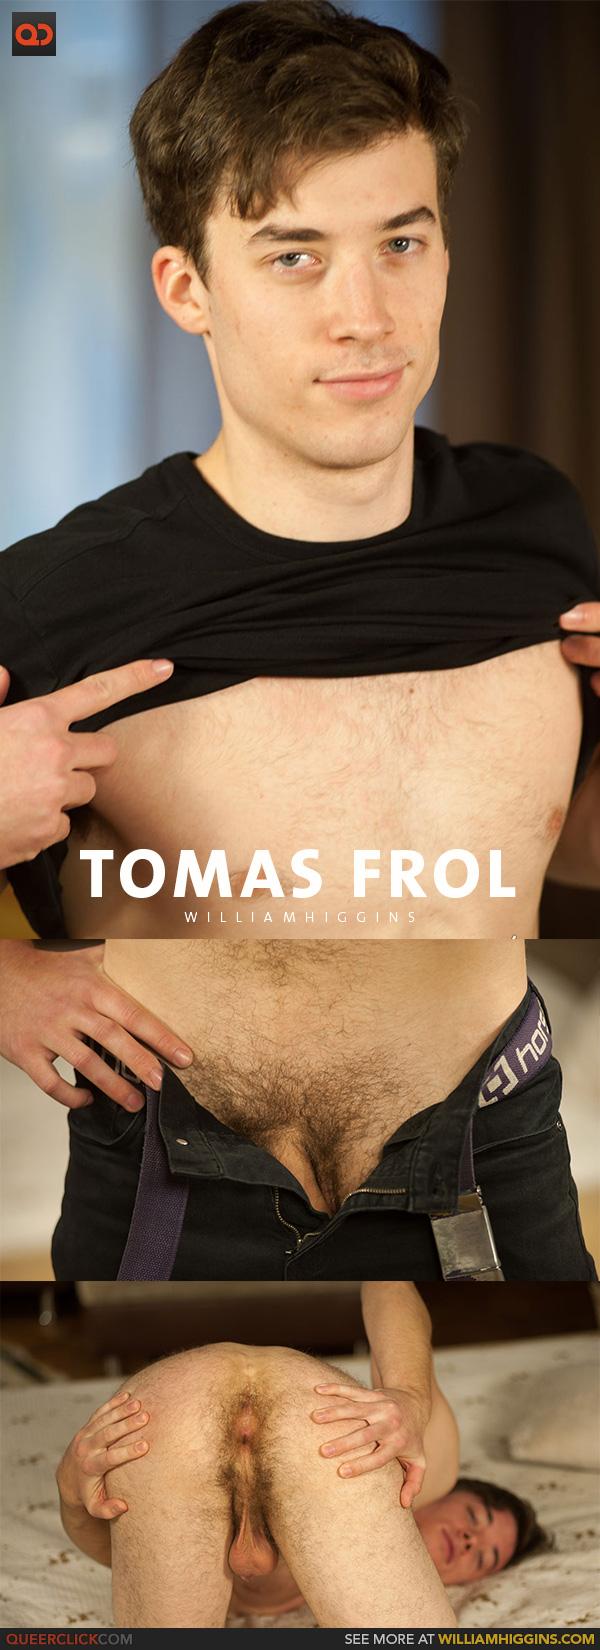 William Higgins: Tomas Frol